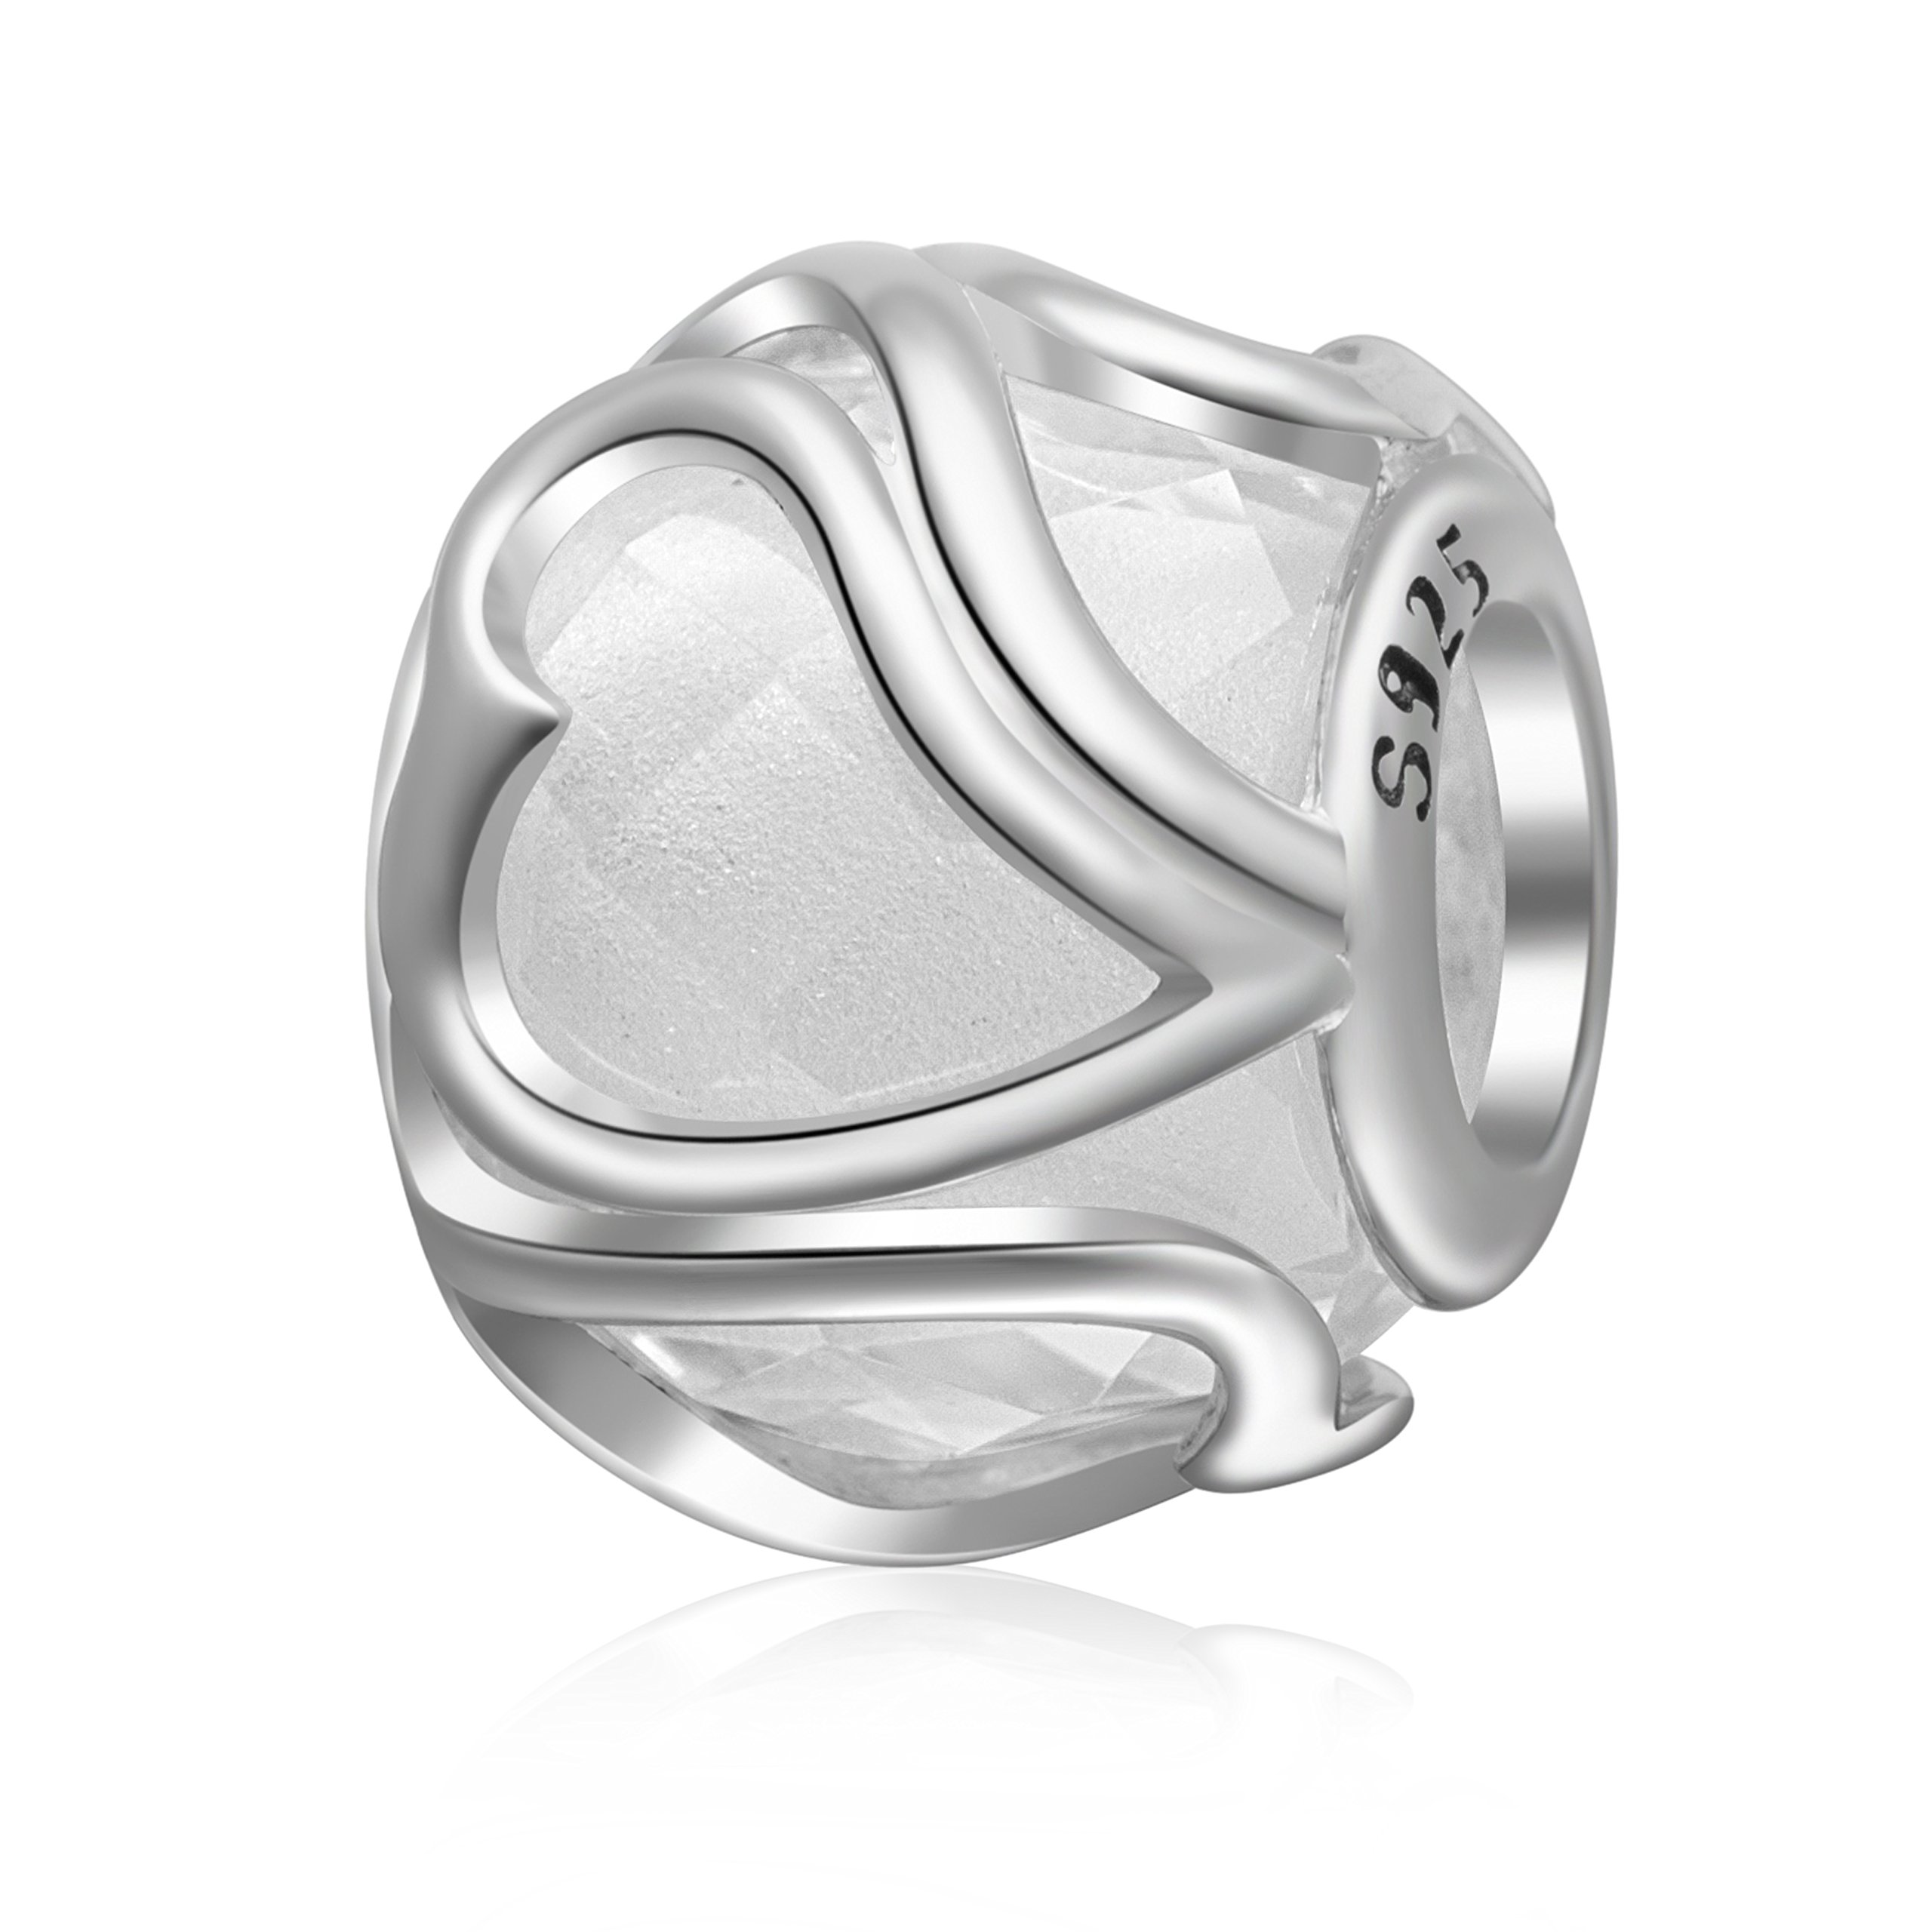 ABUN Radiant Heart Glass Charm 925 Sterling Silver Birthstone Love Charm for 3mm Snake Chain Bracelet (clear)